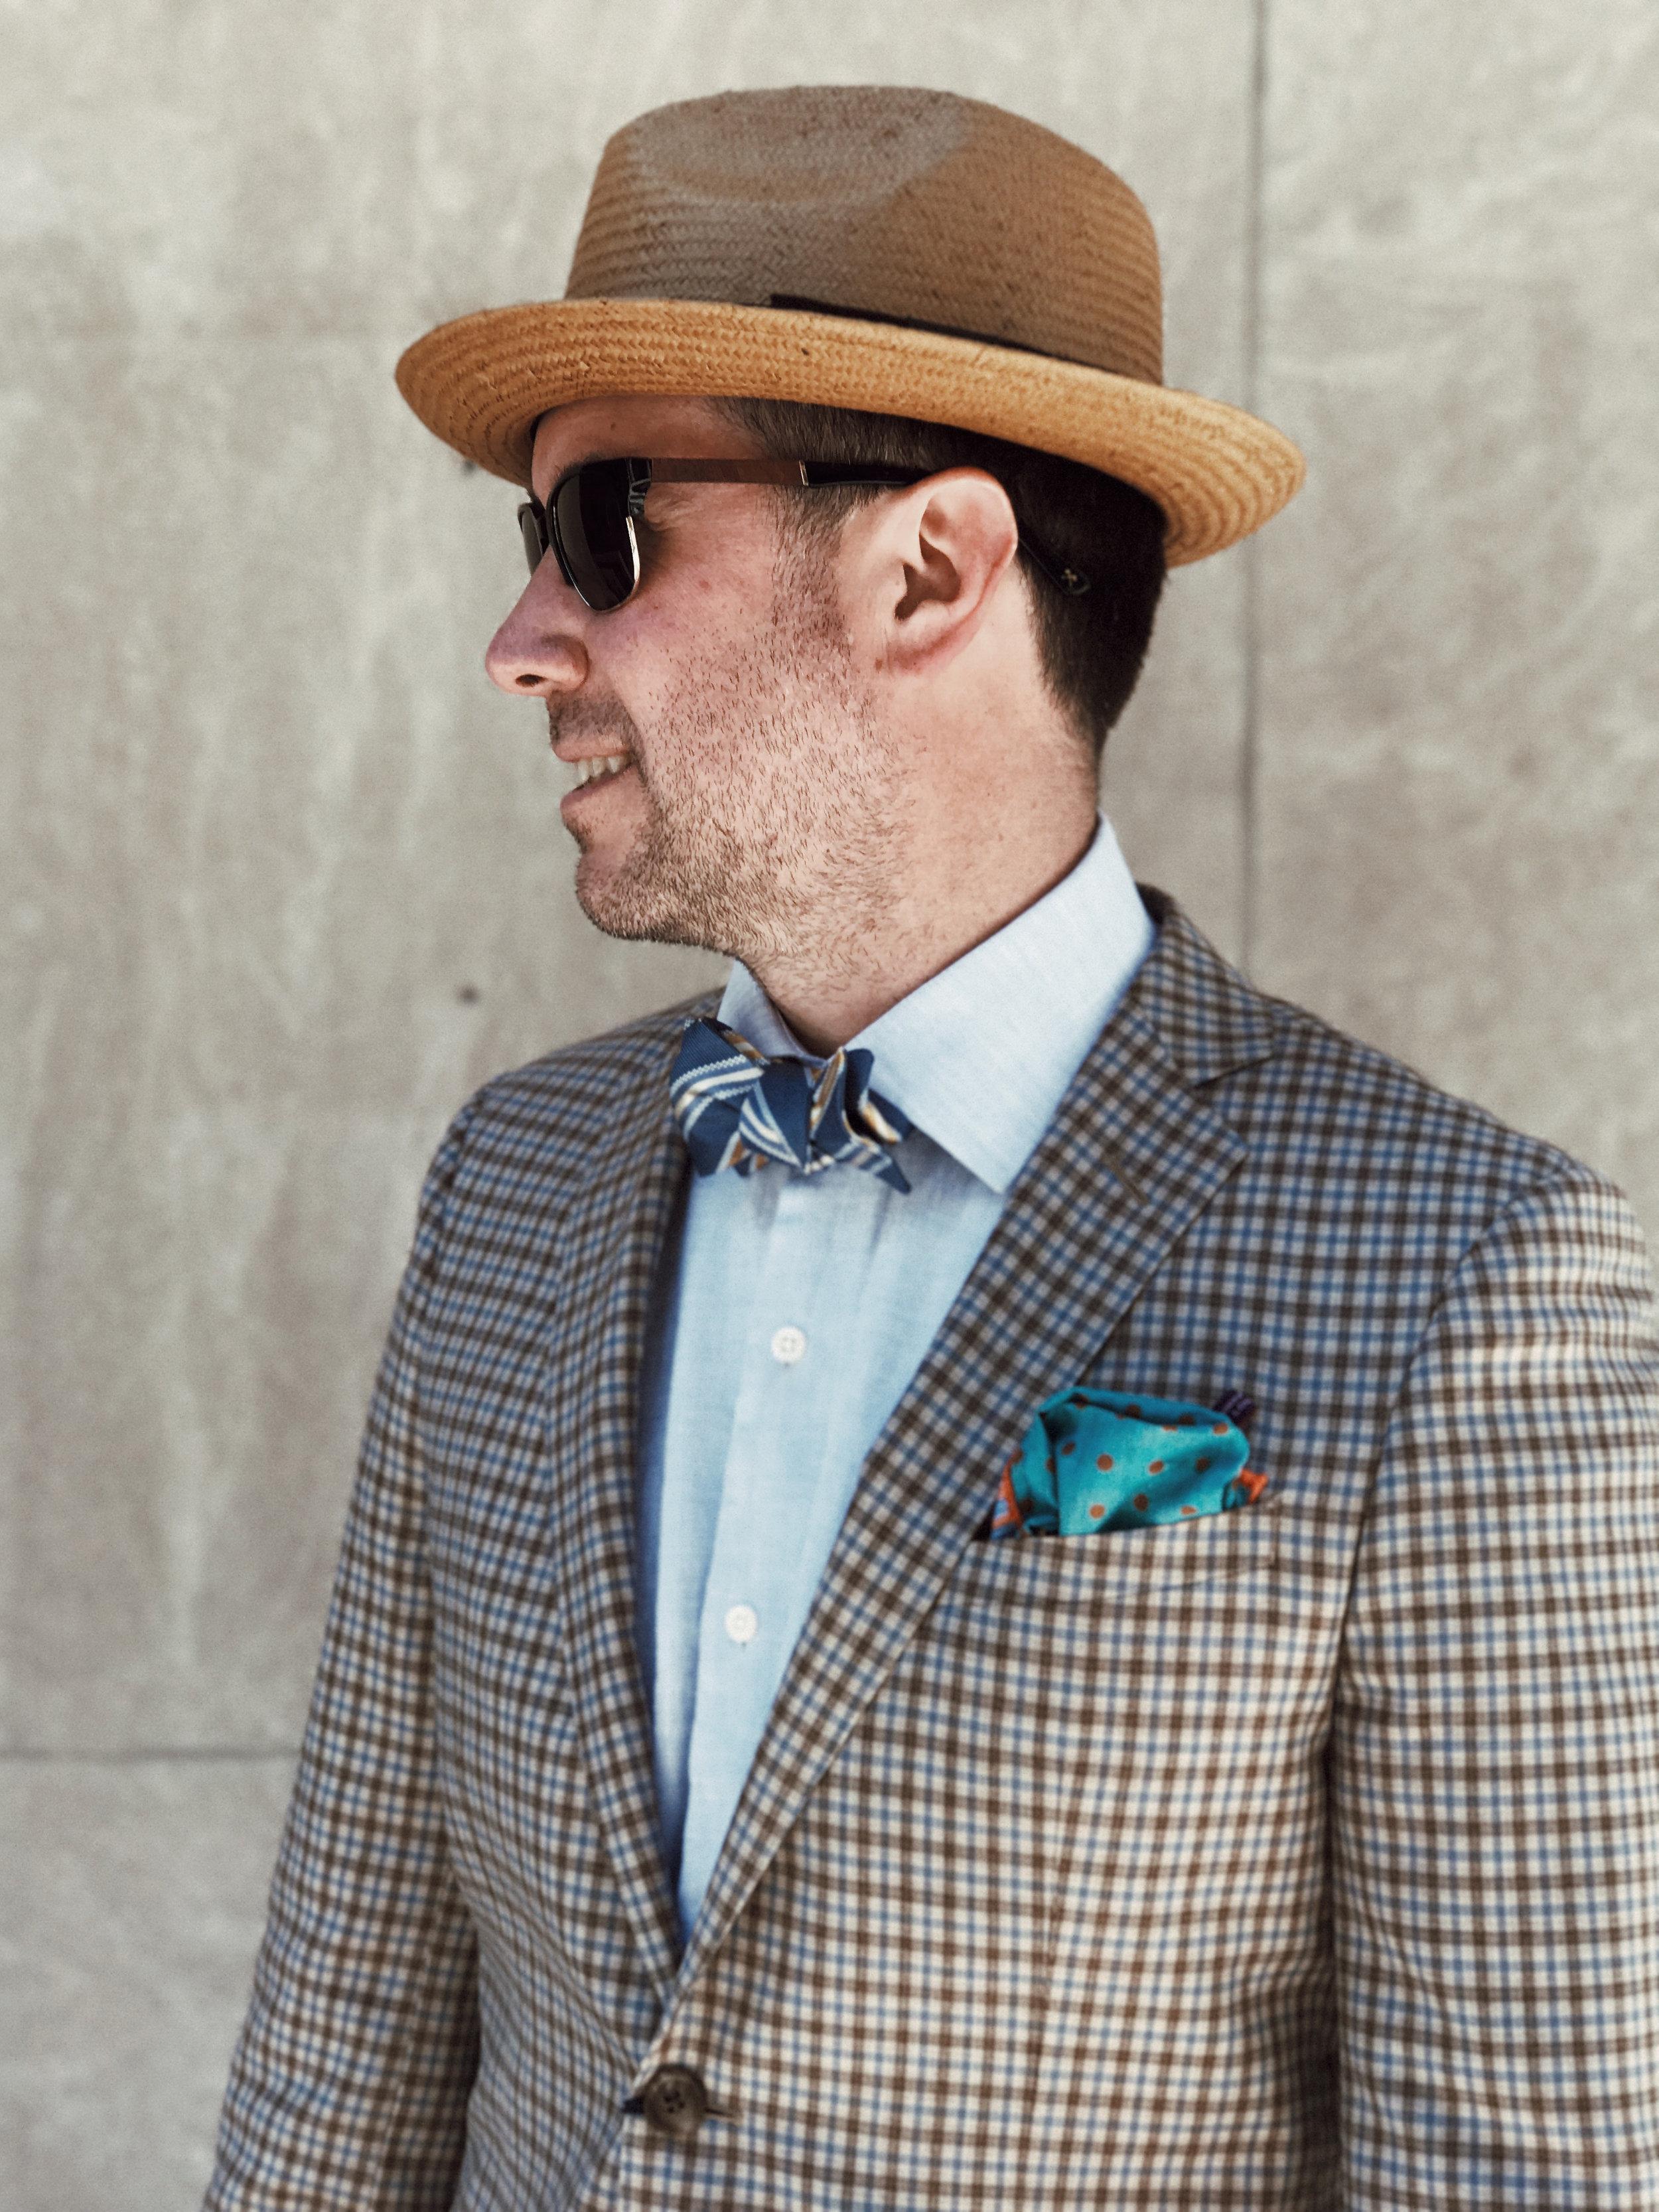 On Craig: Sunglasses: Shwood,Shirt: Peter Millar,Jacket: BluJacket,Bowtie: The QG,Pocket Square:  Seaward & Stern